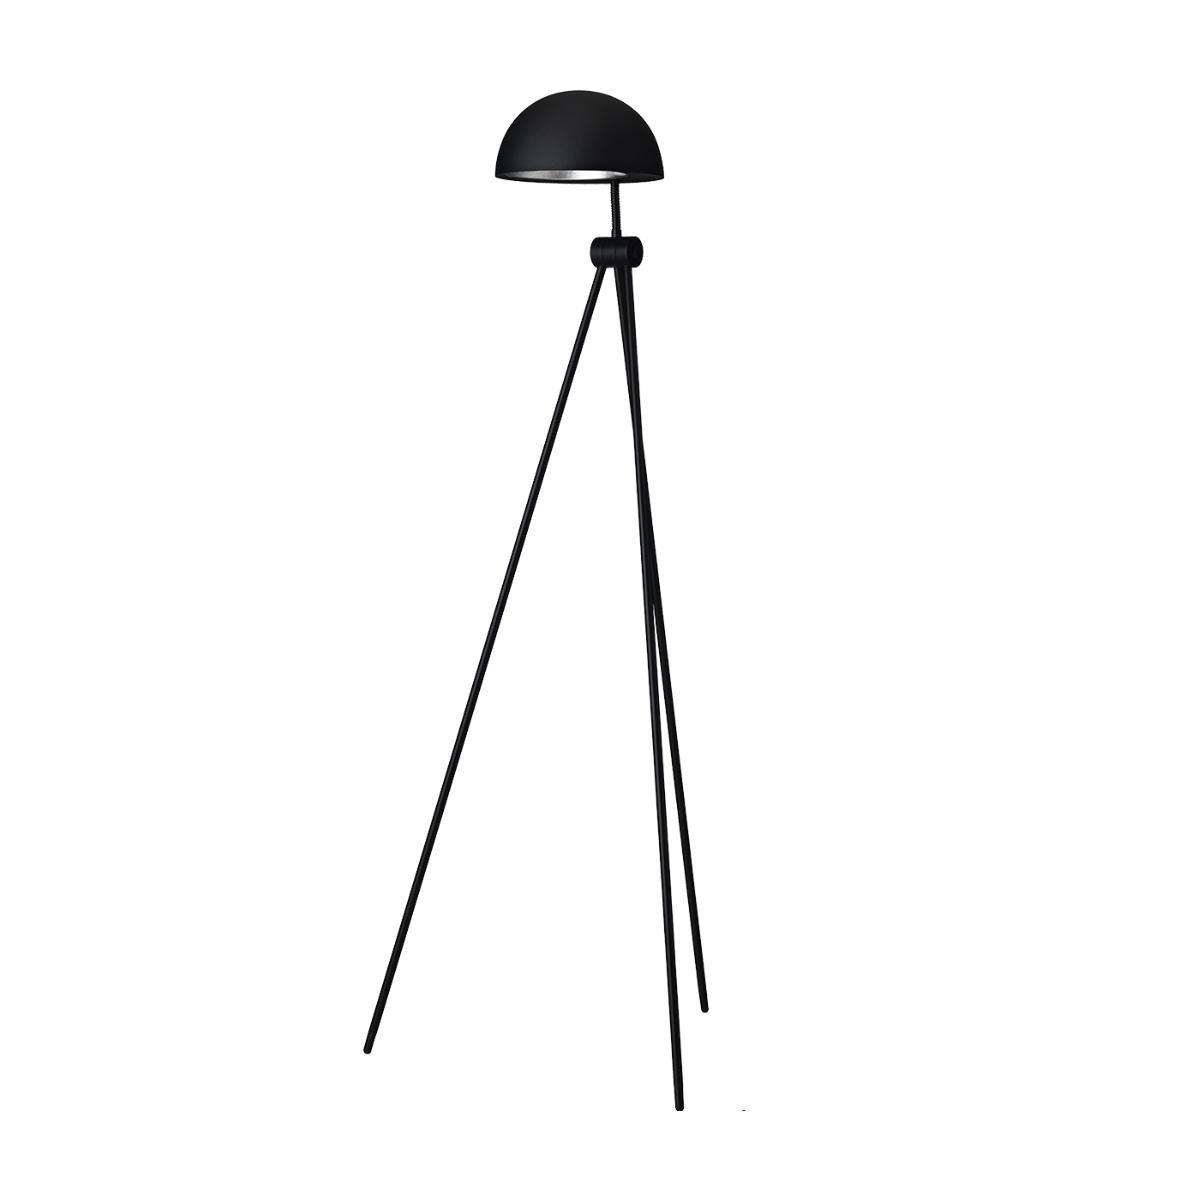 Fritz Hansen - Lampadaire Radon™ - noir/mat/H 120cm / Ø 47cm/câble noir